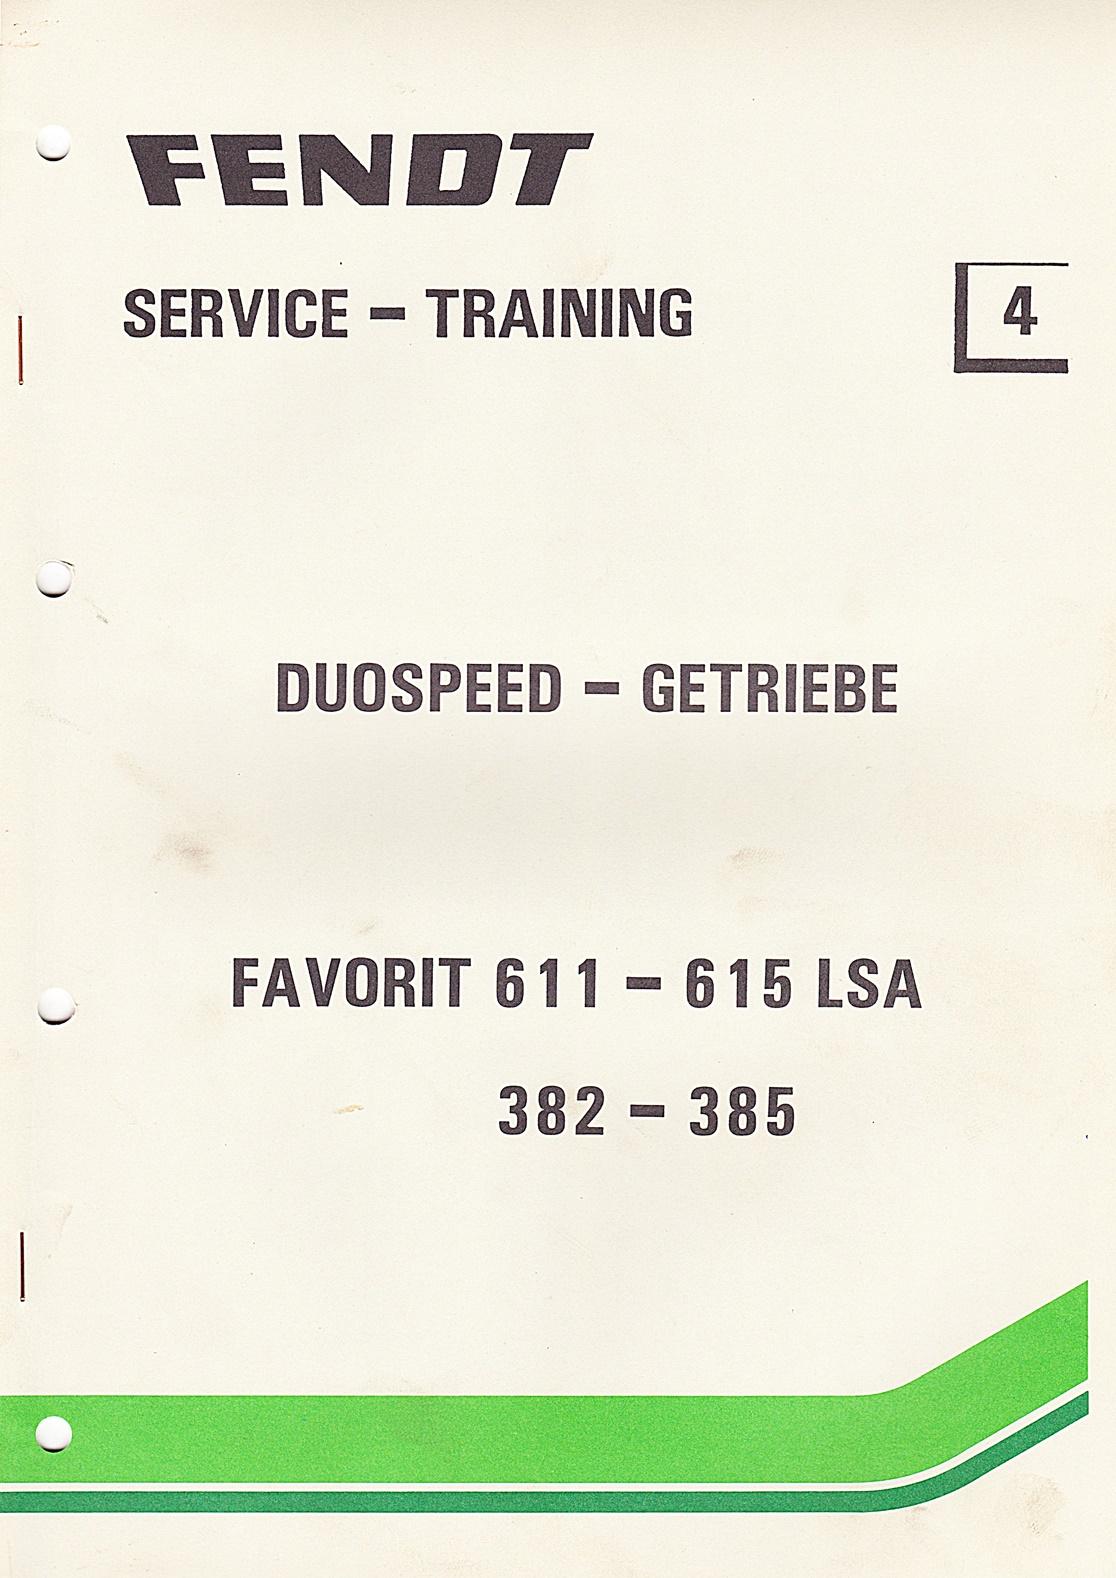 Fendt Service - Training Nr. 4 Duospeed - Getriebe